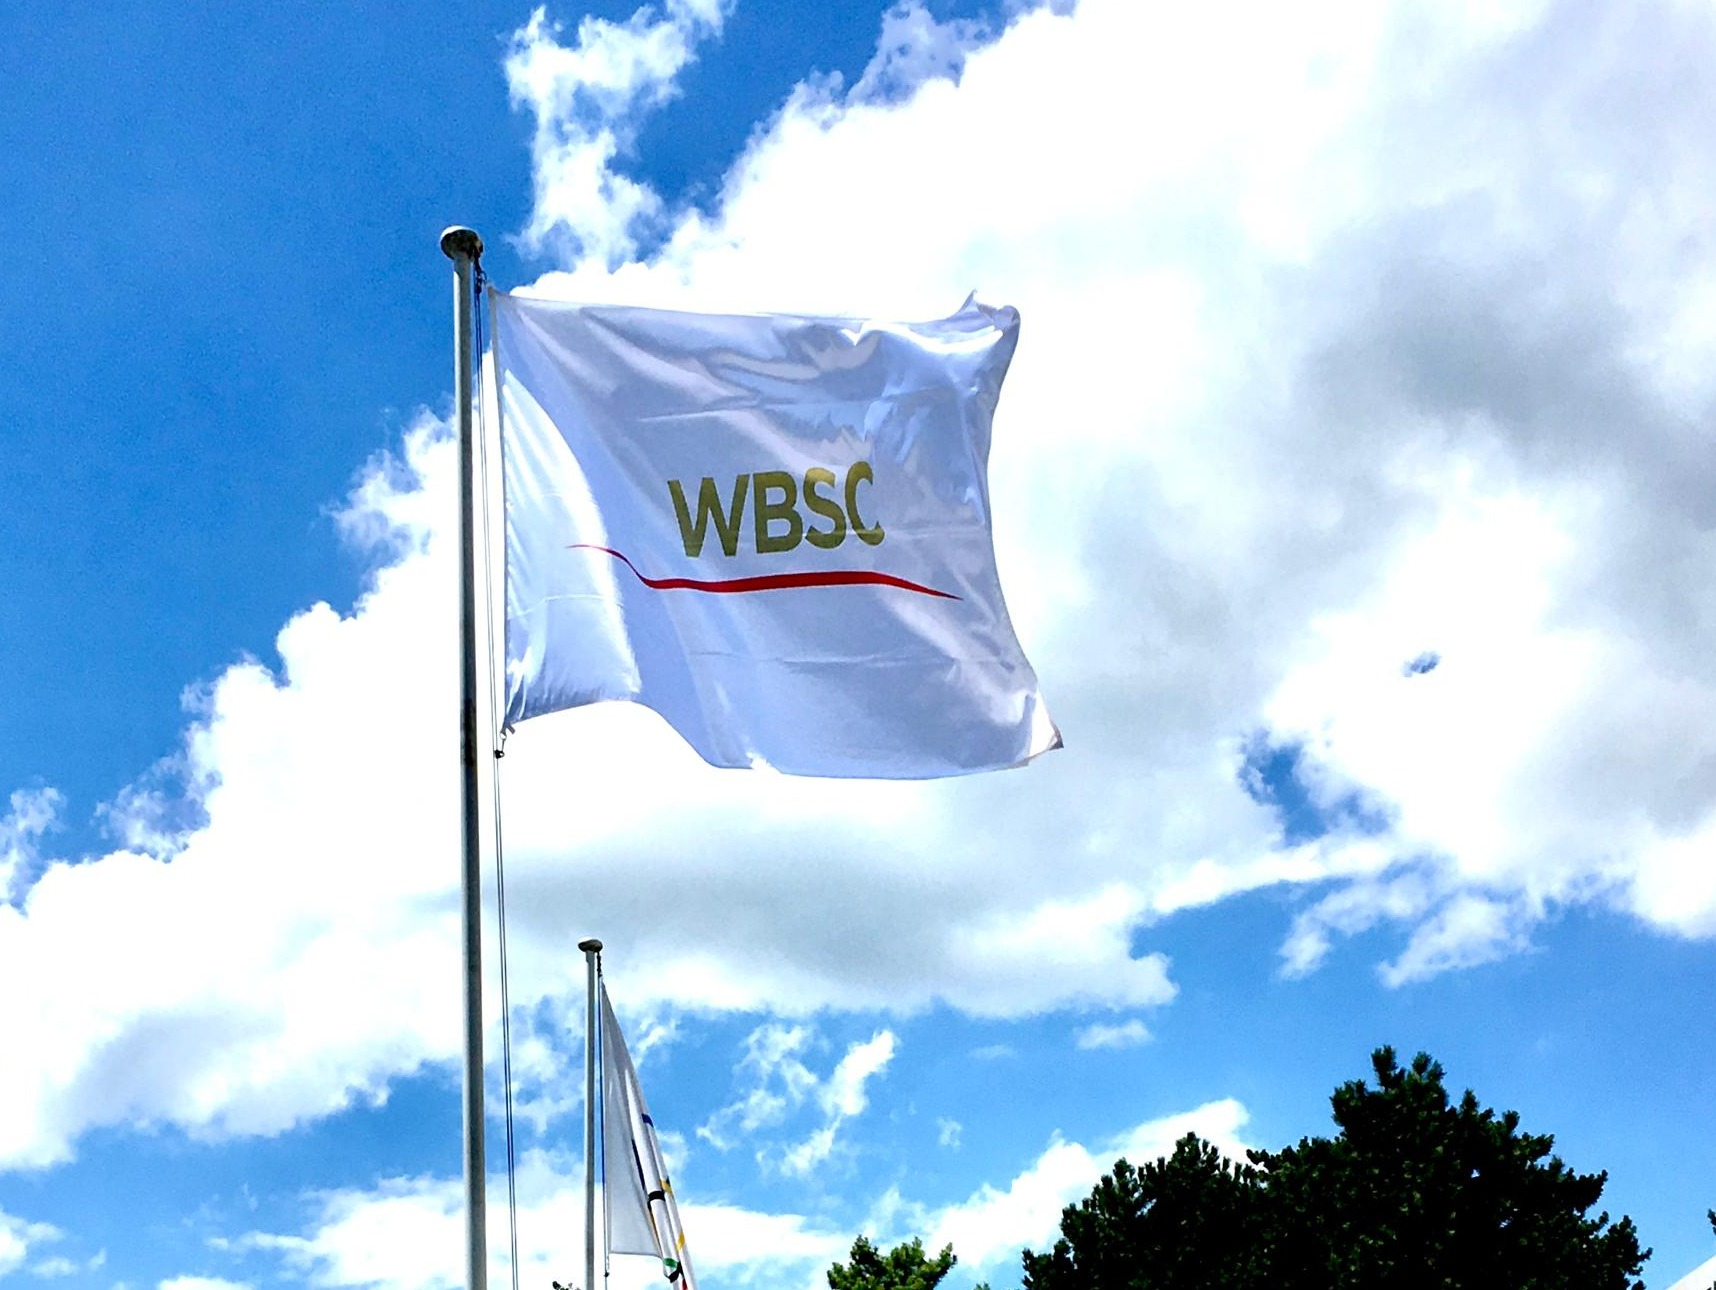 WBSC flag